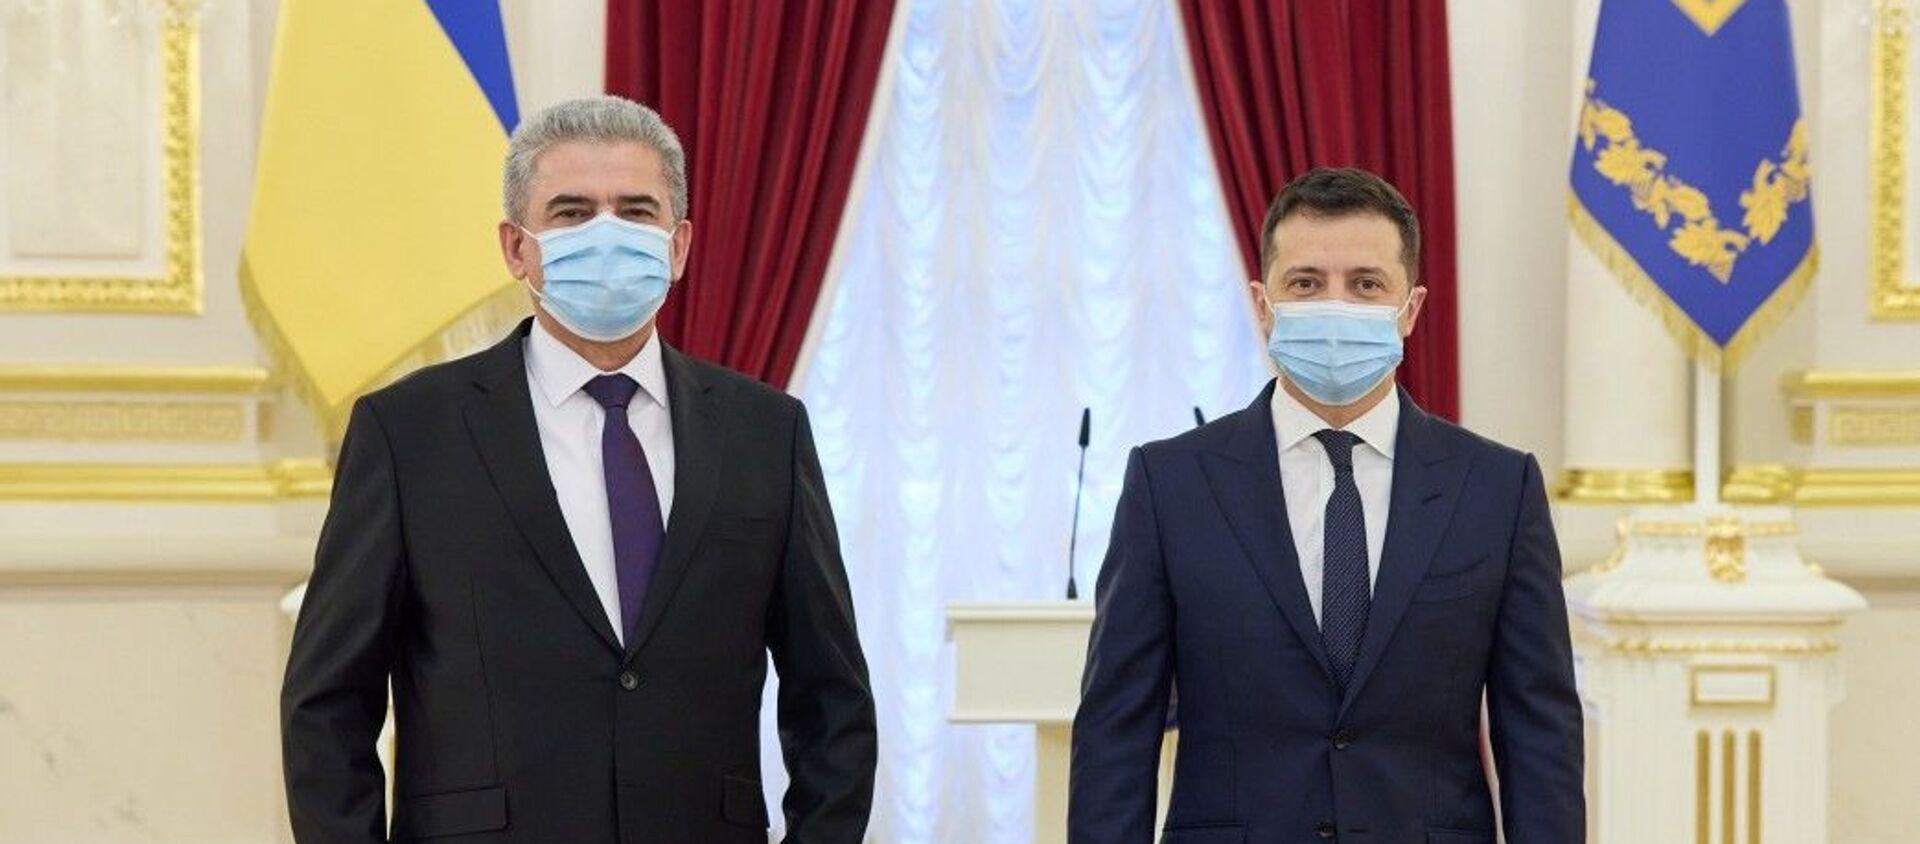 Президент Украины Владимир Зеленский и посол Таджикистана Хайдар Давлатали - Sputnik Таджикистан, 1920, 12.12.2020